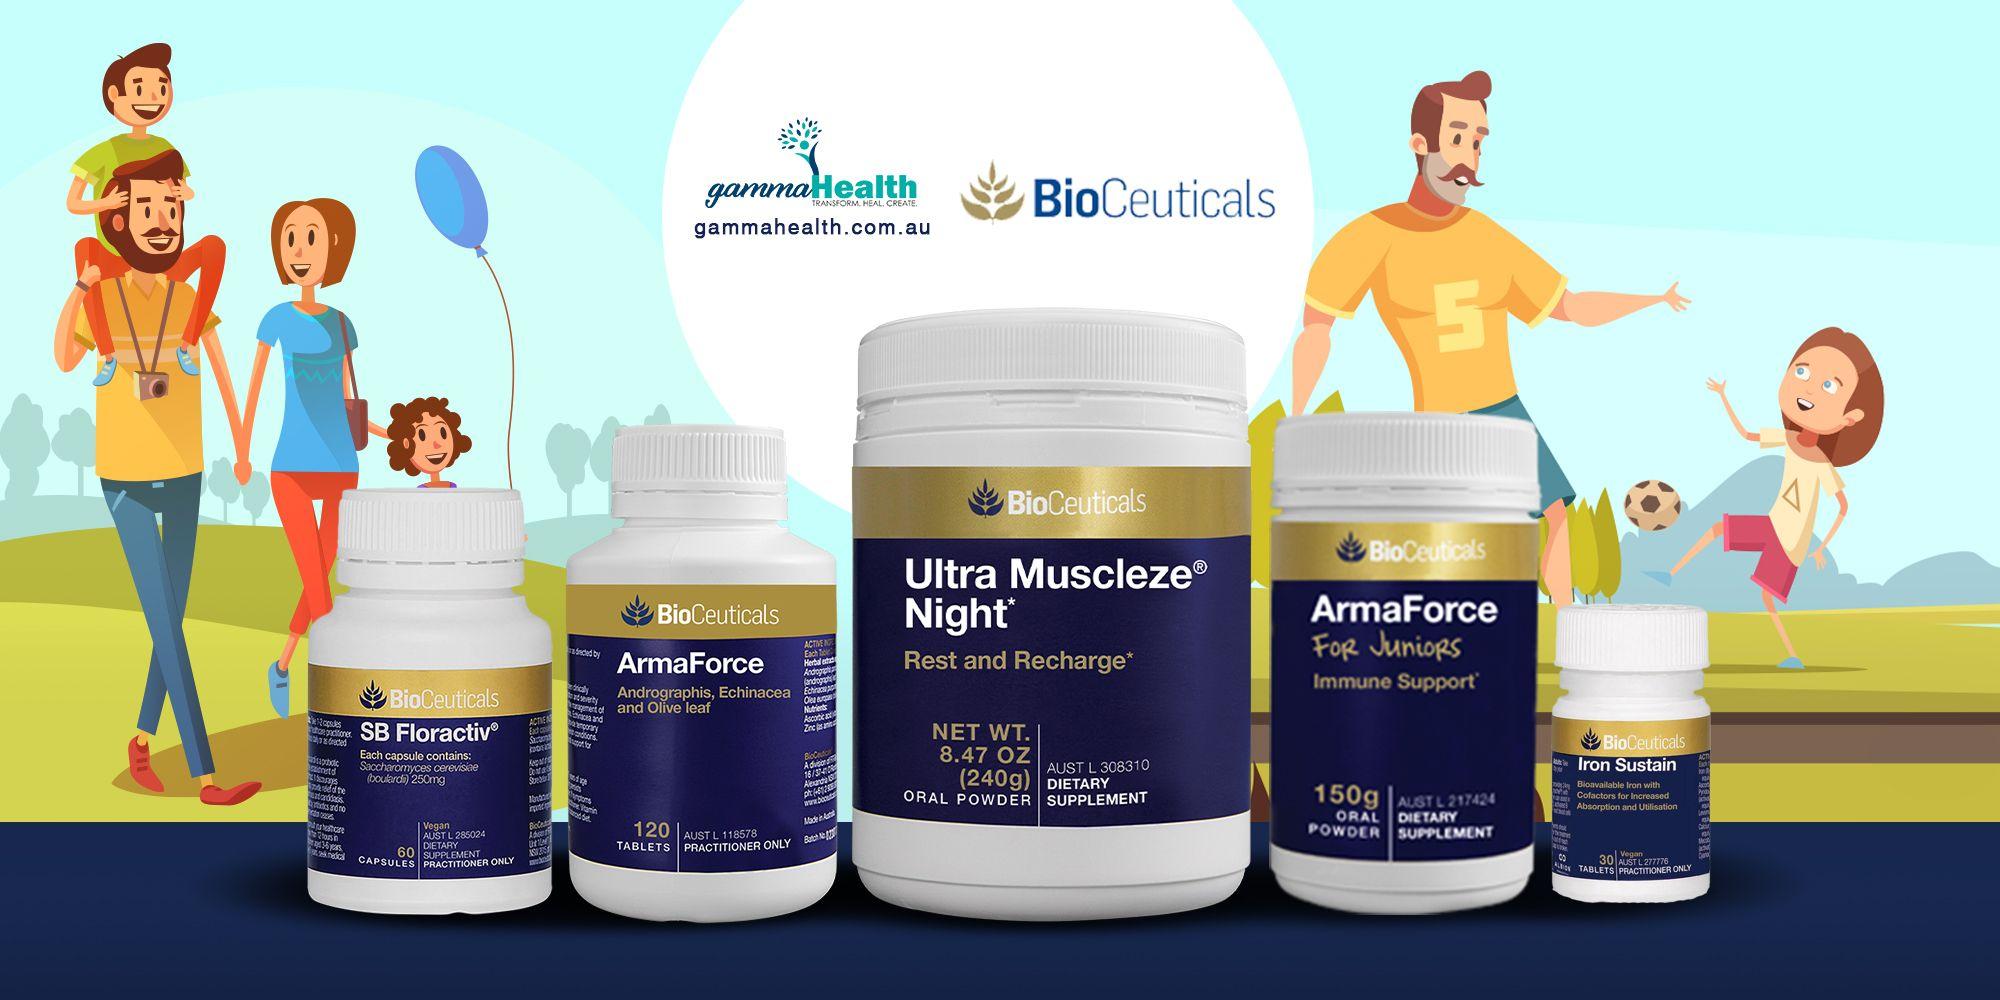 Bioceuticals is australias leading provider of